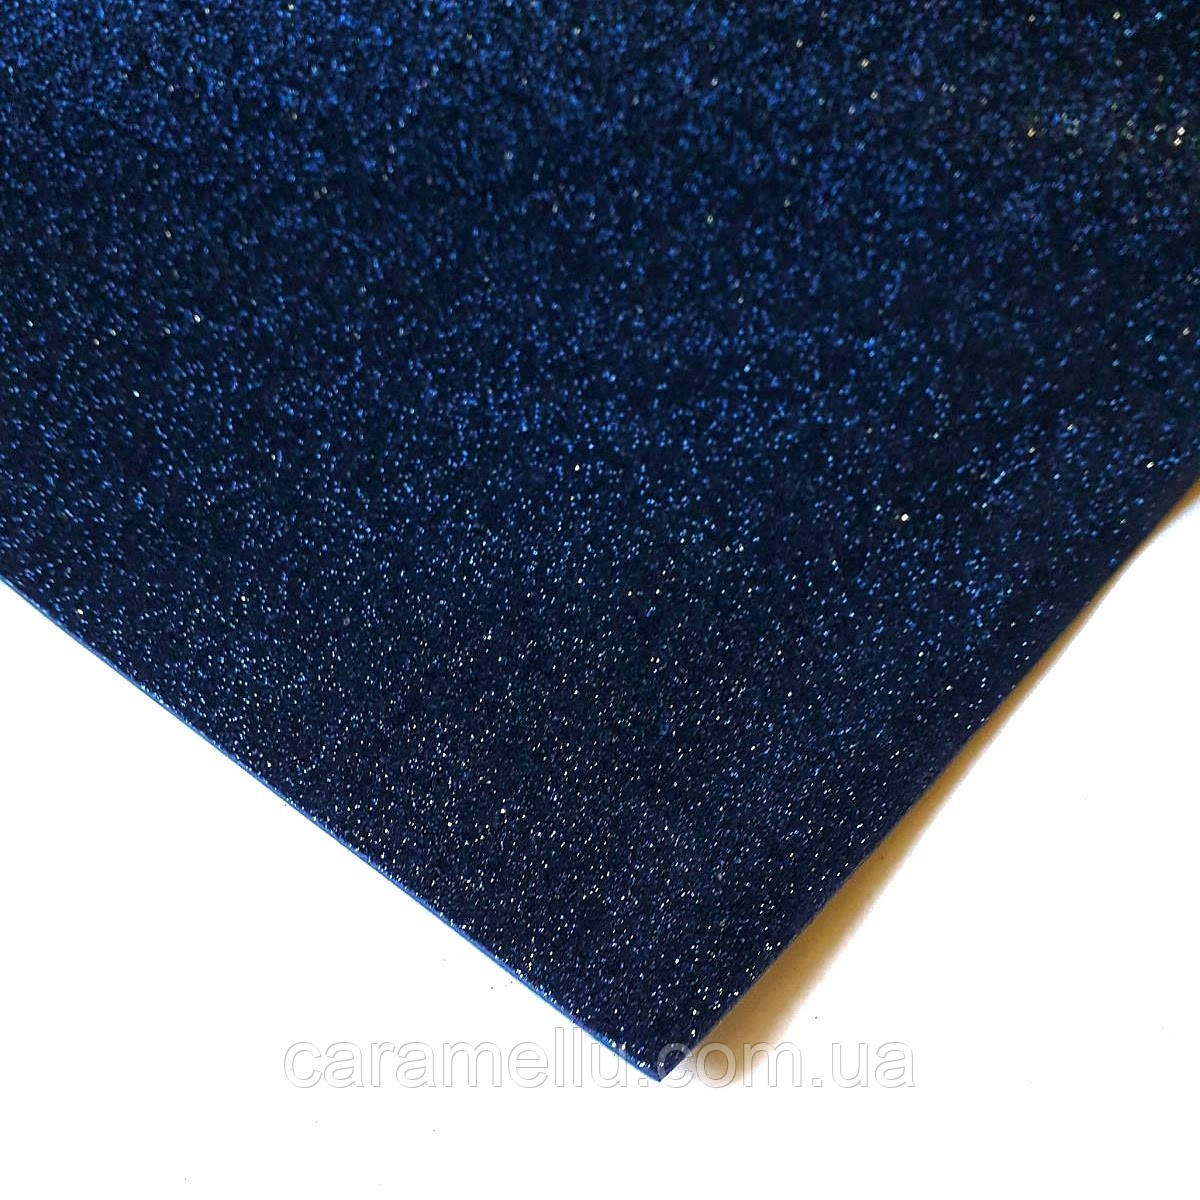 Глиттерный фоамиран 2мм.темно-синий. 40*60 см